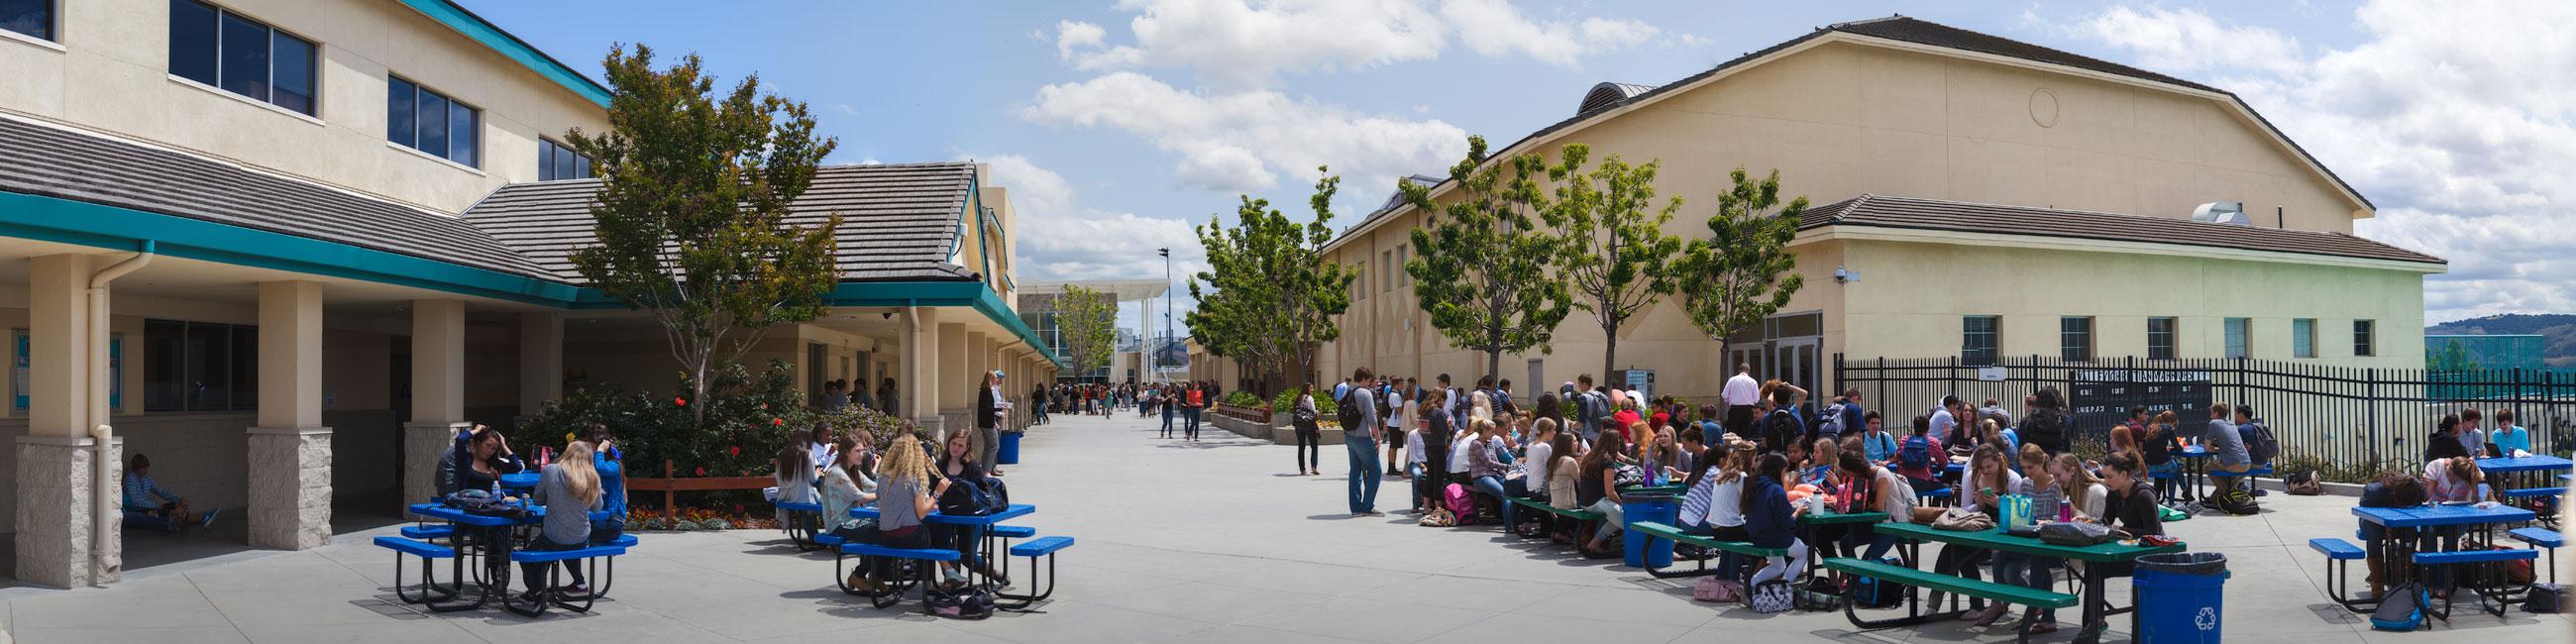 Valley Christian Schools - San Jose: High School